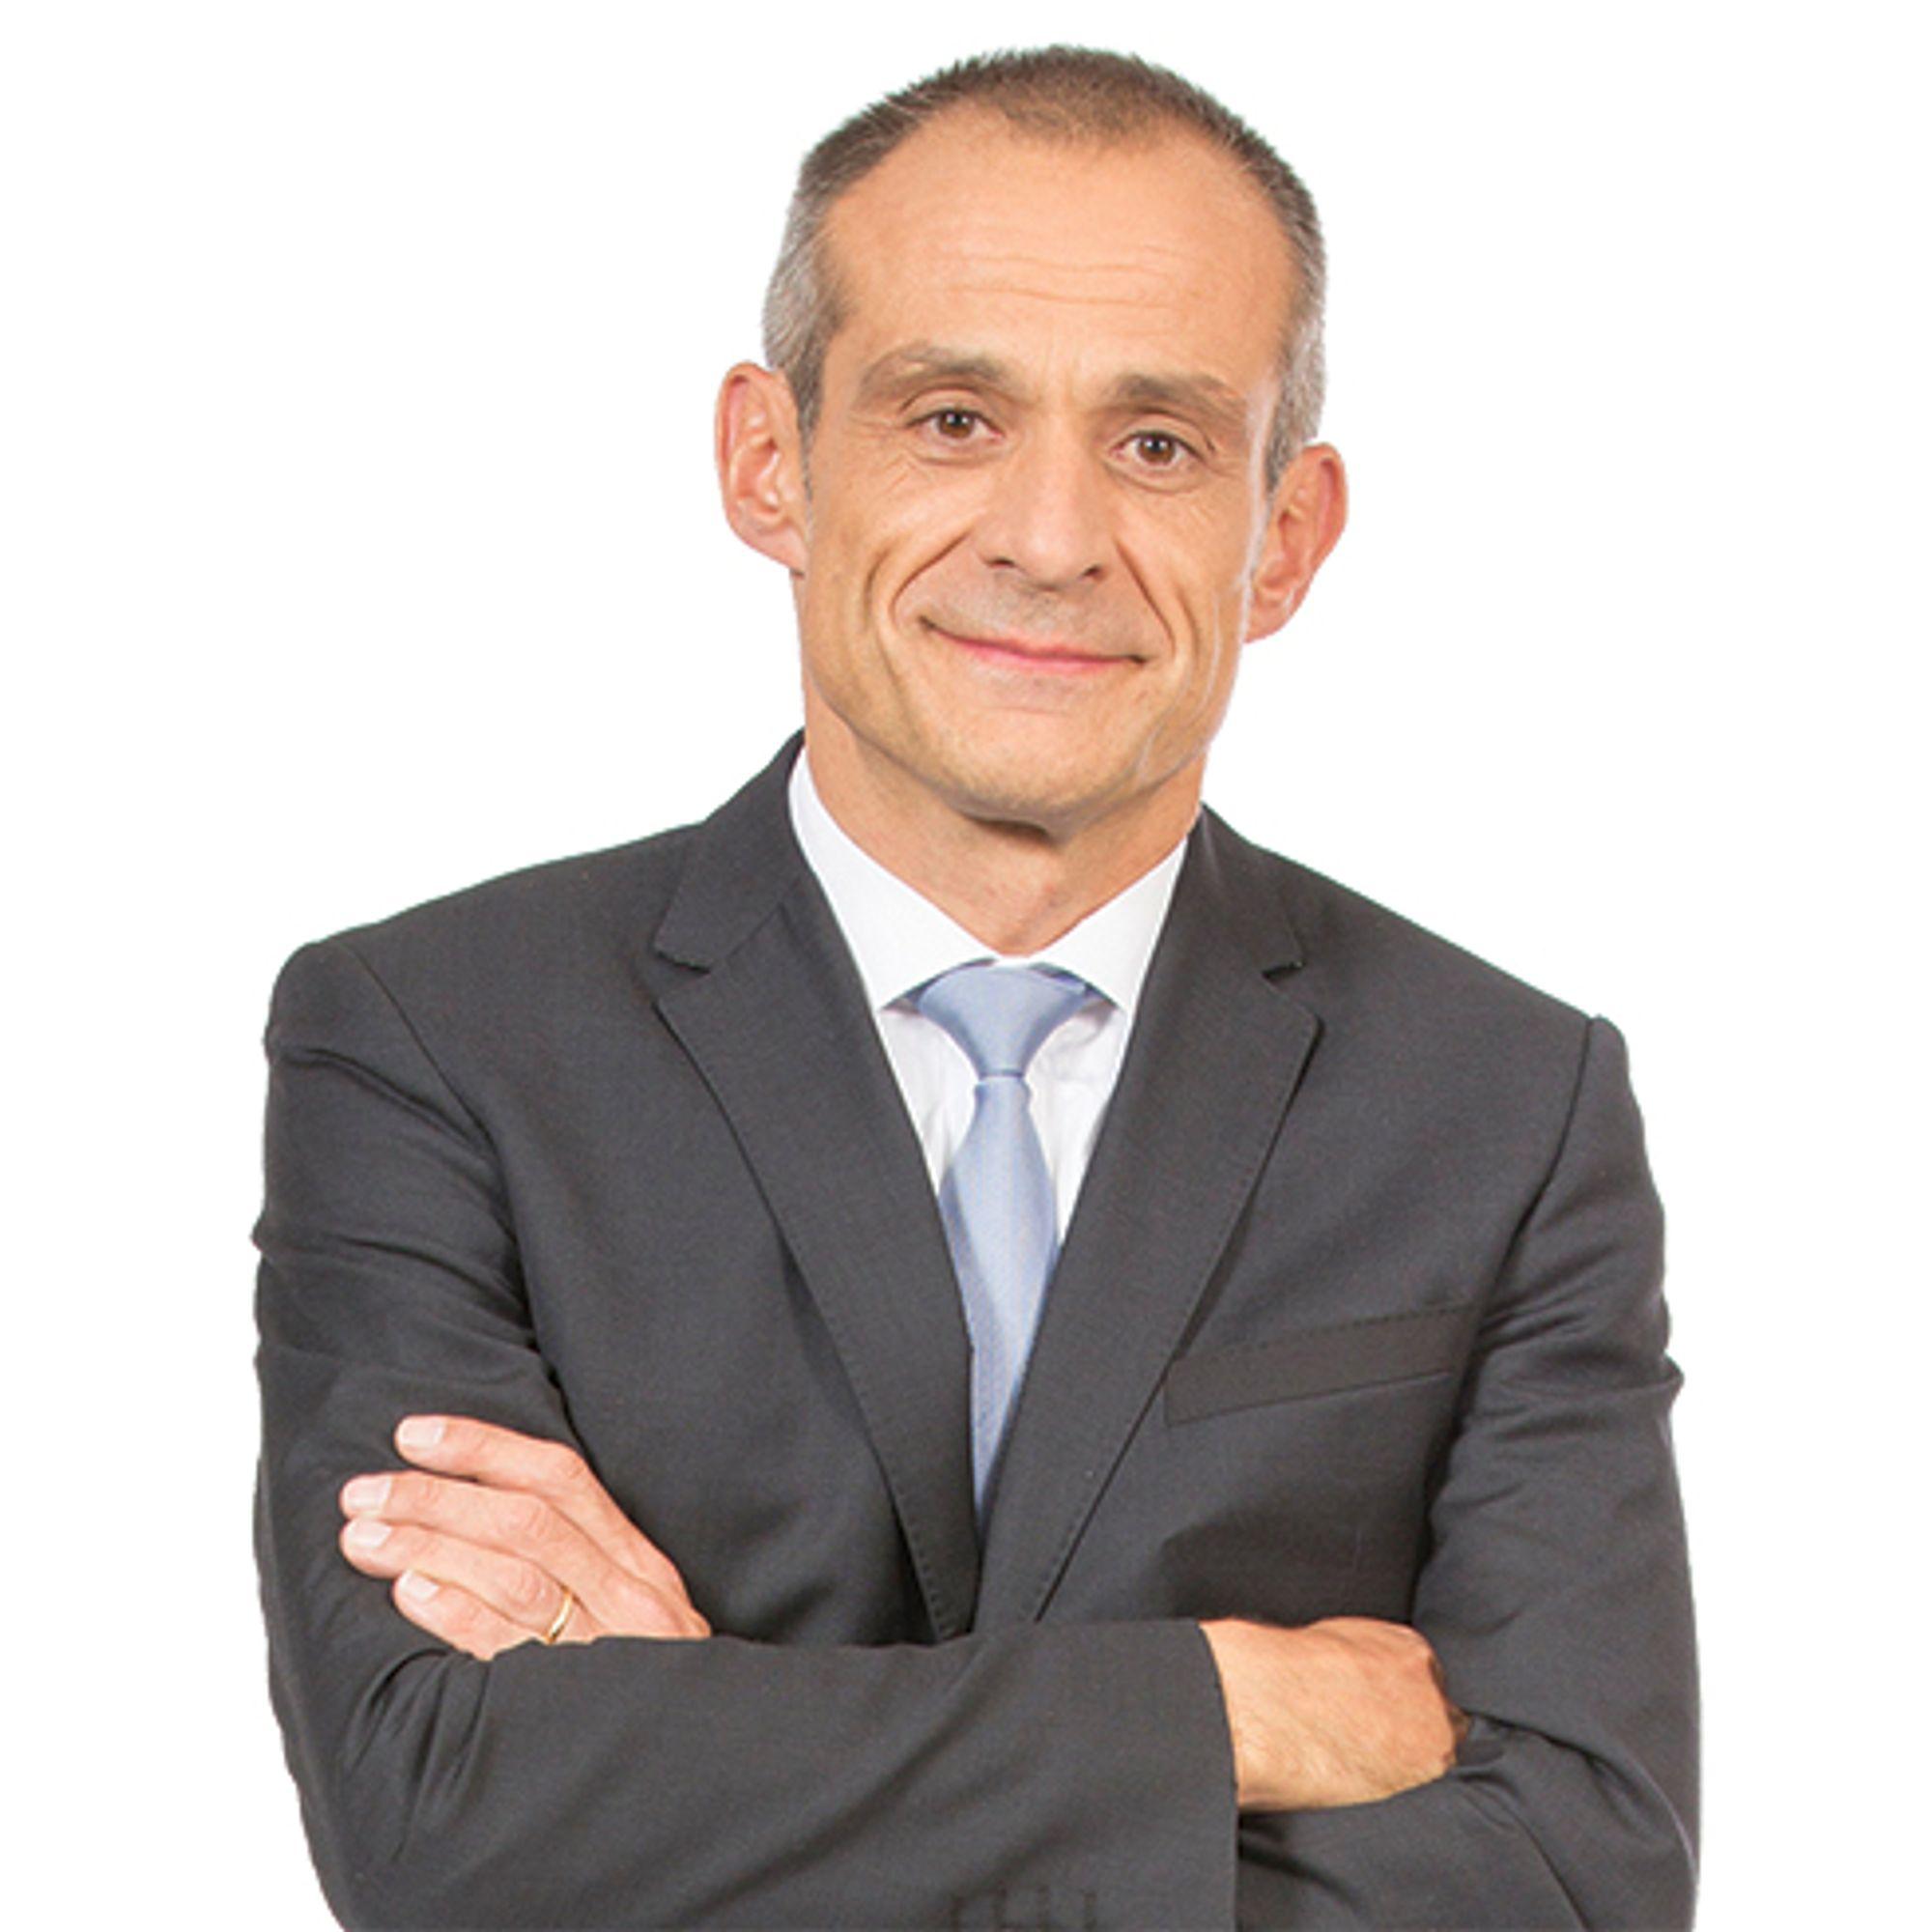 Jean-Pascal Tricoire, styreformann og CEO i Schneider Electric.